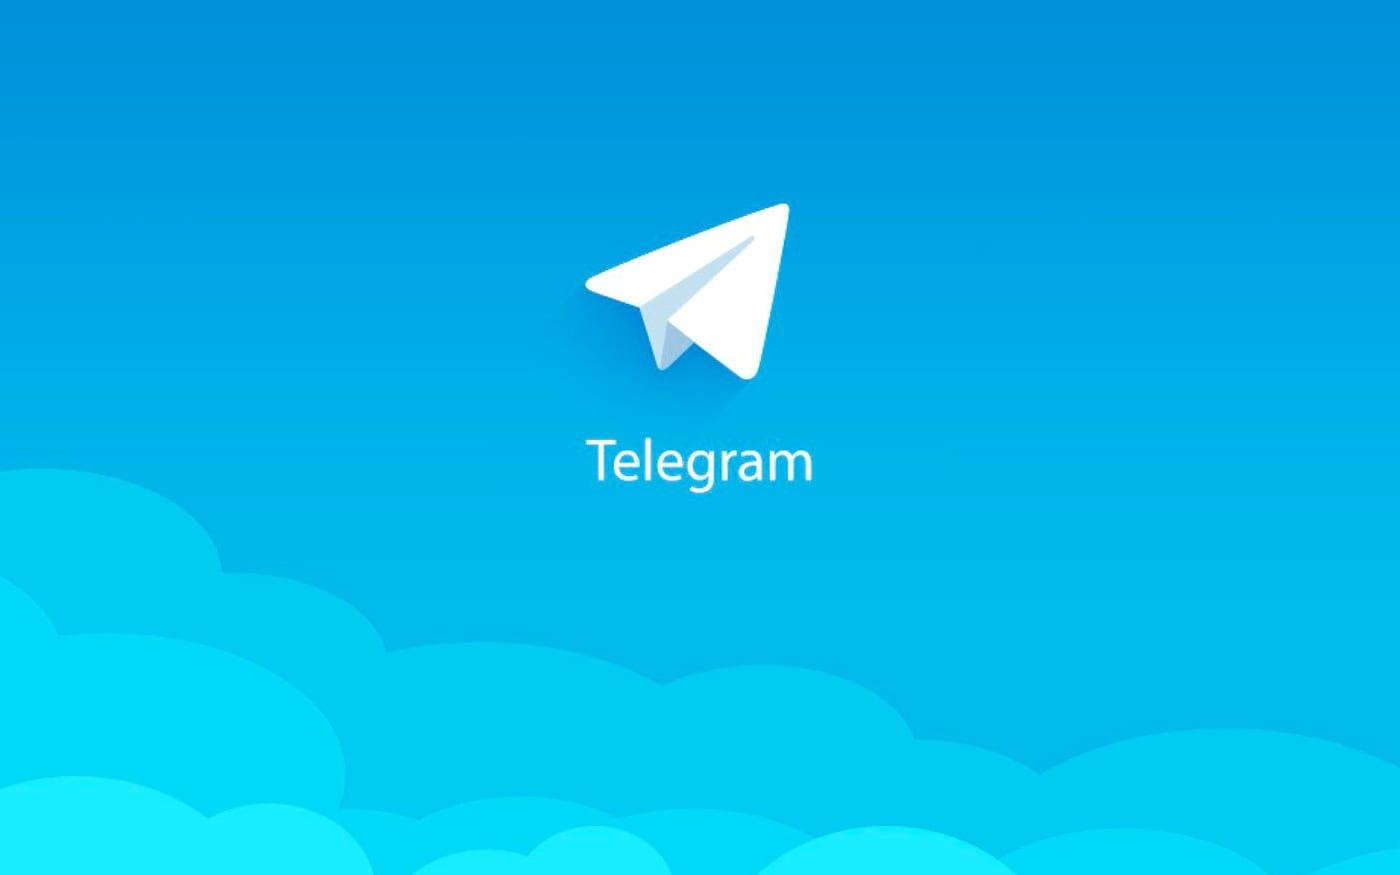 Telegram Grupos: Entenda como achar e entrar nos principais grupos